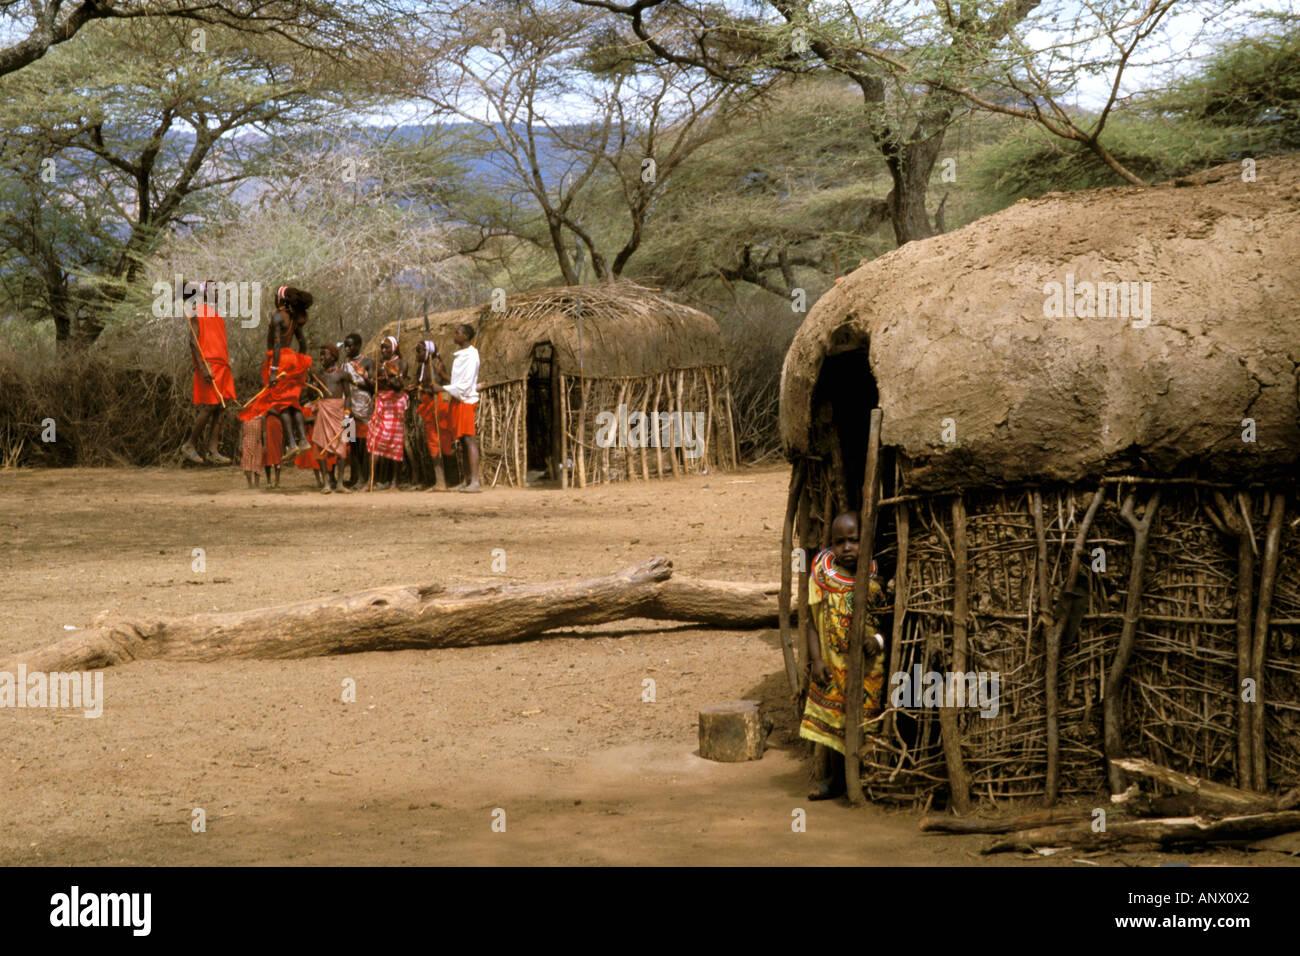 Africa Kenya Masai Mara Kraal Manyatta Jumping Stock. Masai Kraal Manyatta Jumping Houses. Wiring. Diagram Of A House A Manyatta At Scoala.co